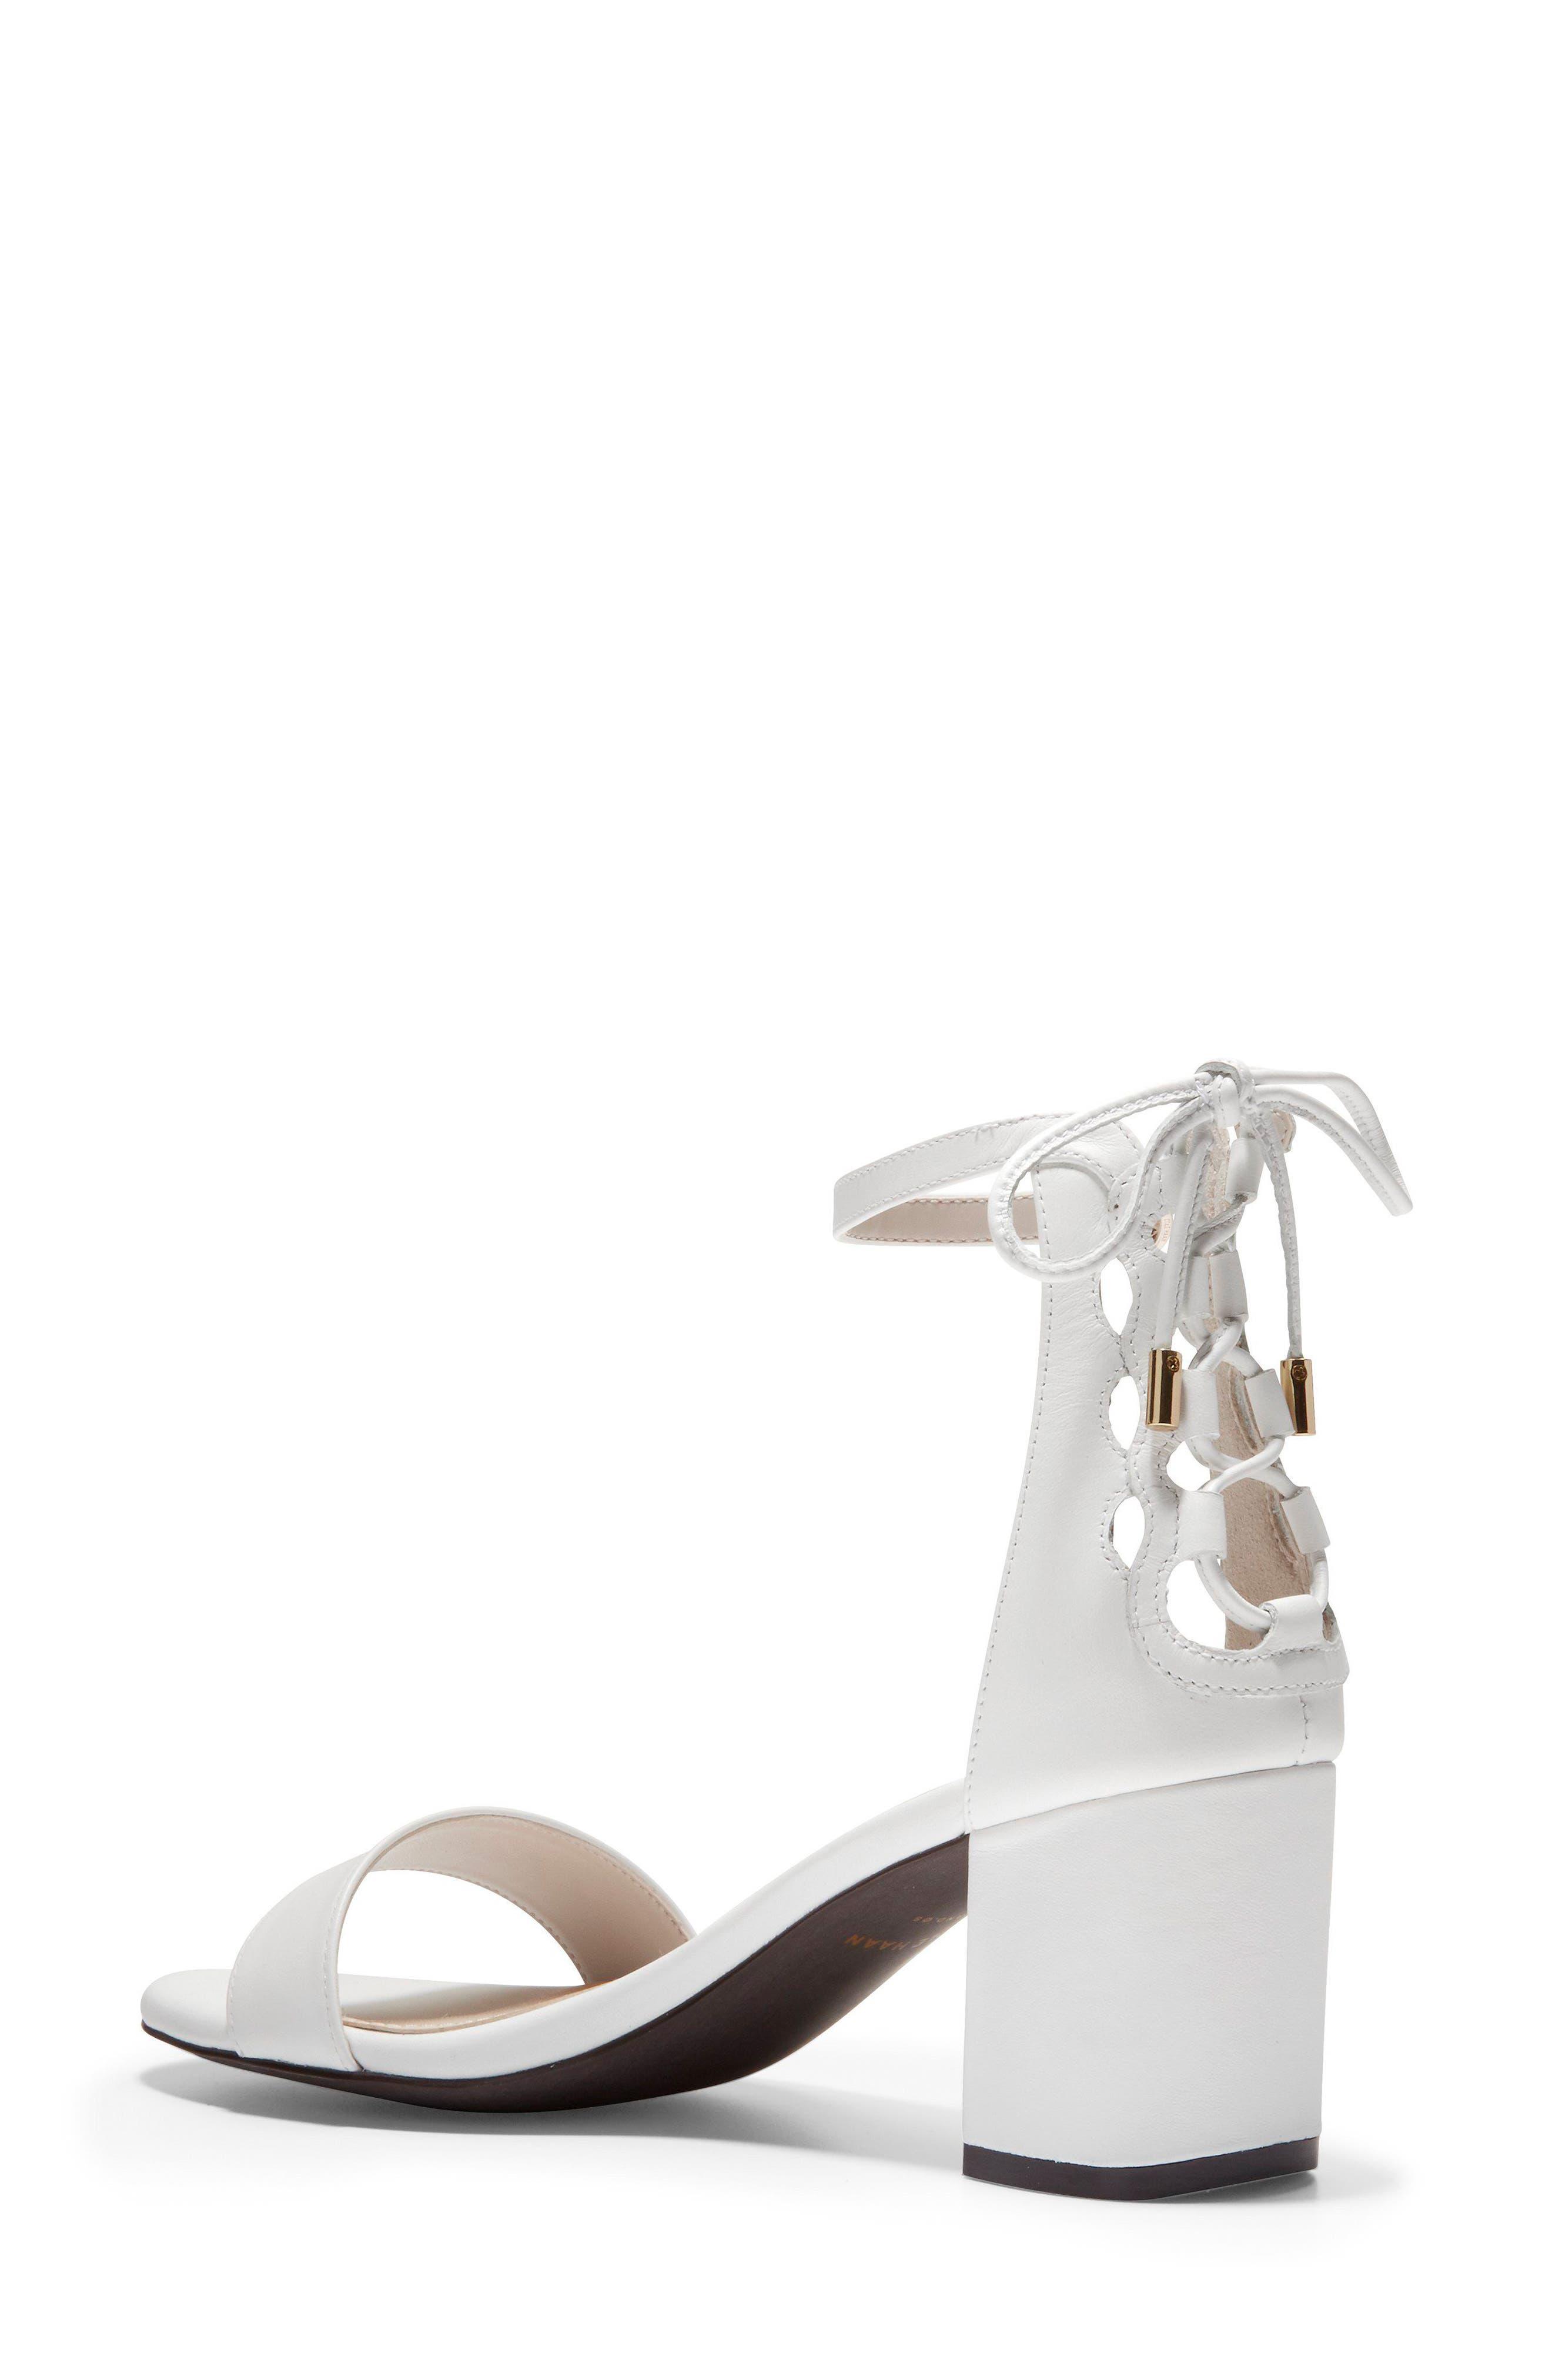 Leah Sandal,                             Alternate thumbnail 2, color,                             White Leather